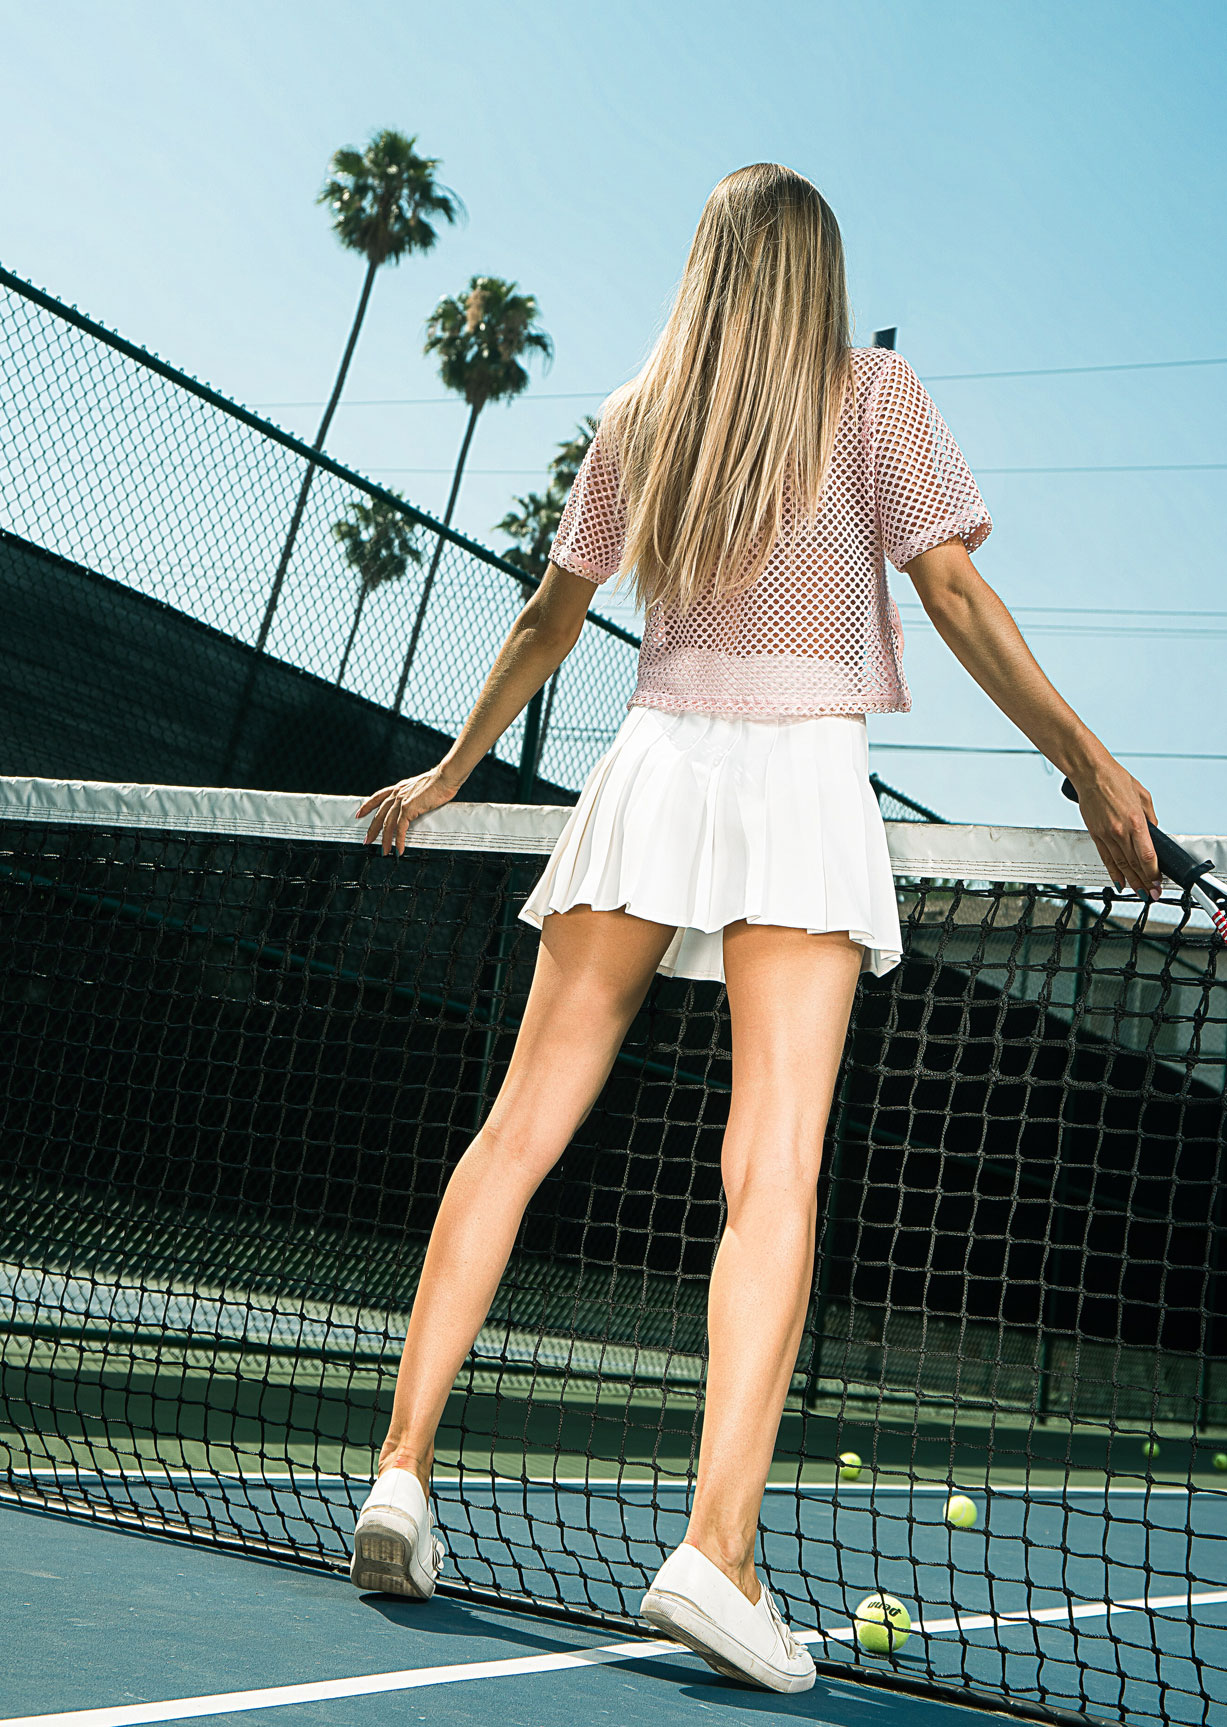 Swing / Играем в теннис с Элизой Бренд / Jeliza Brand by Mark Hanson - Toksick Magazine